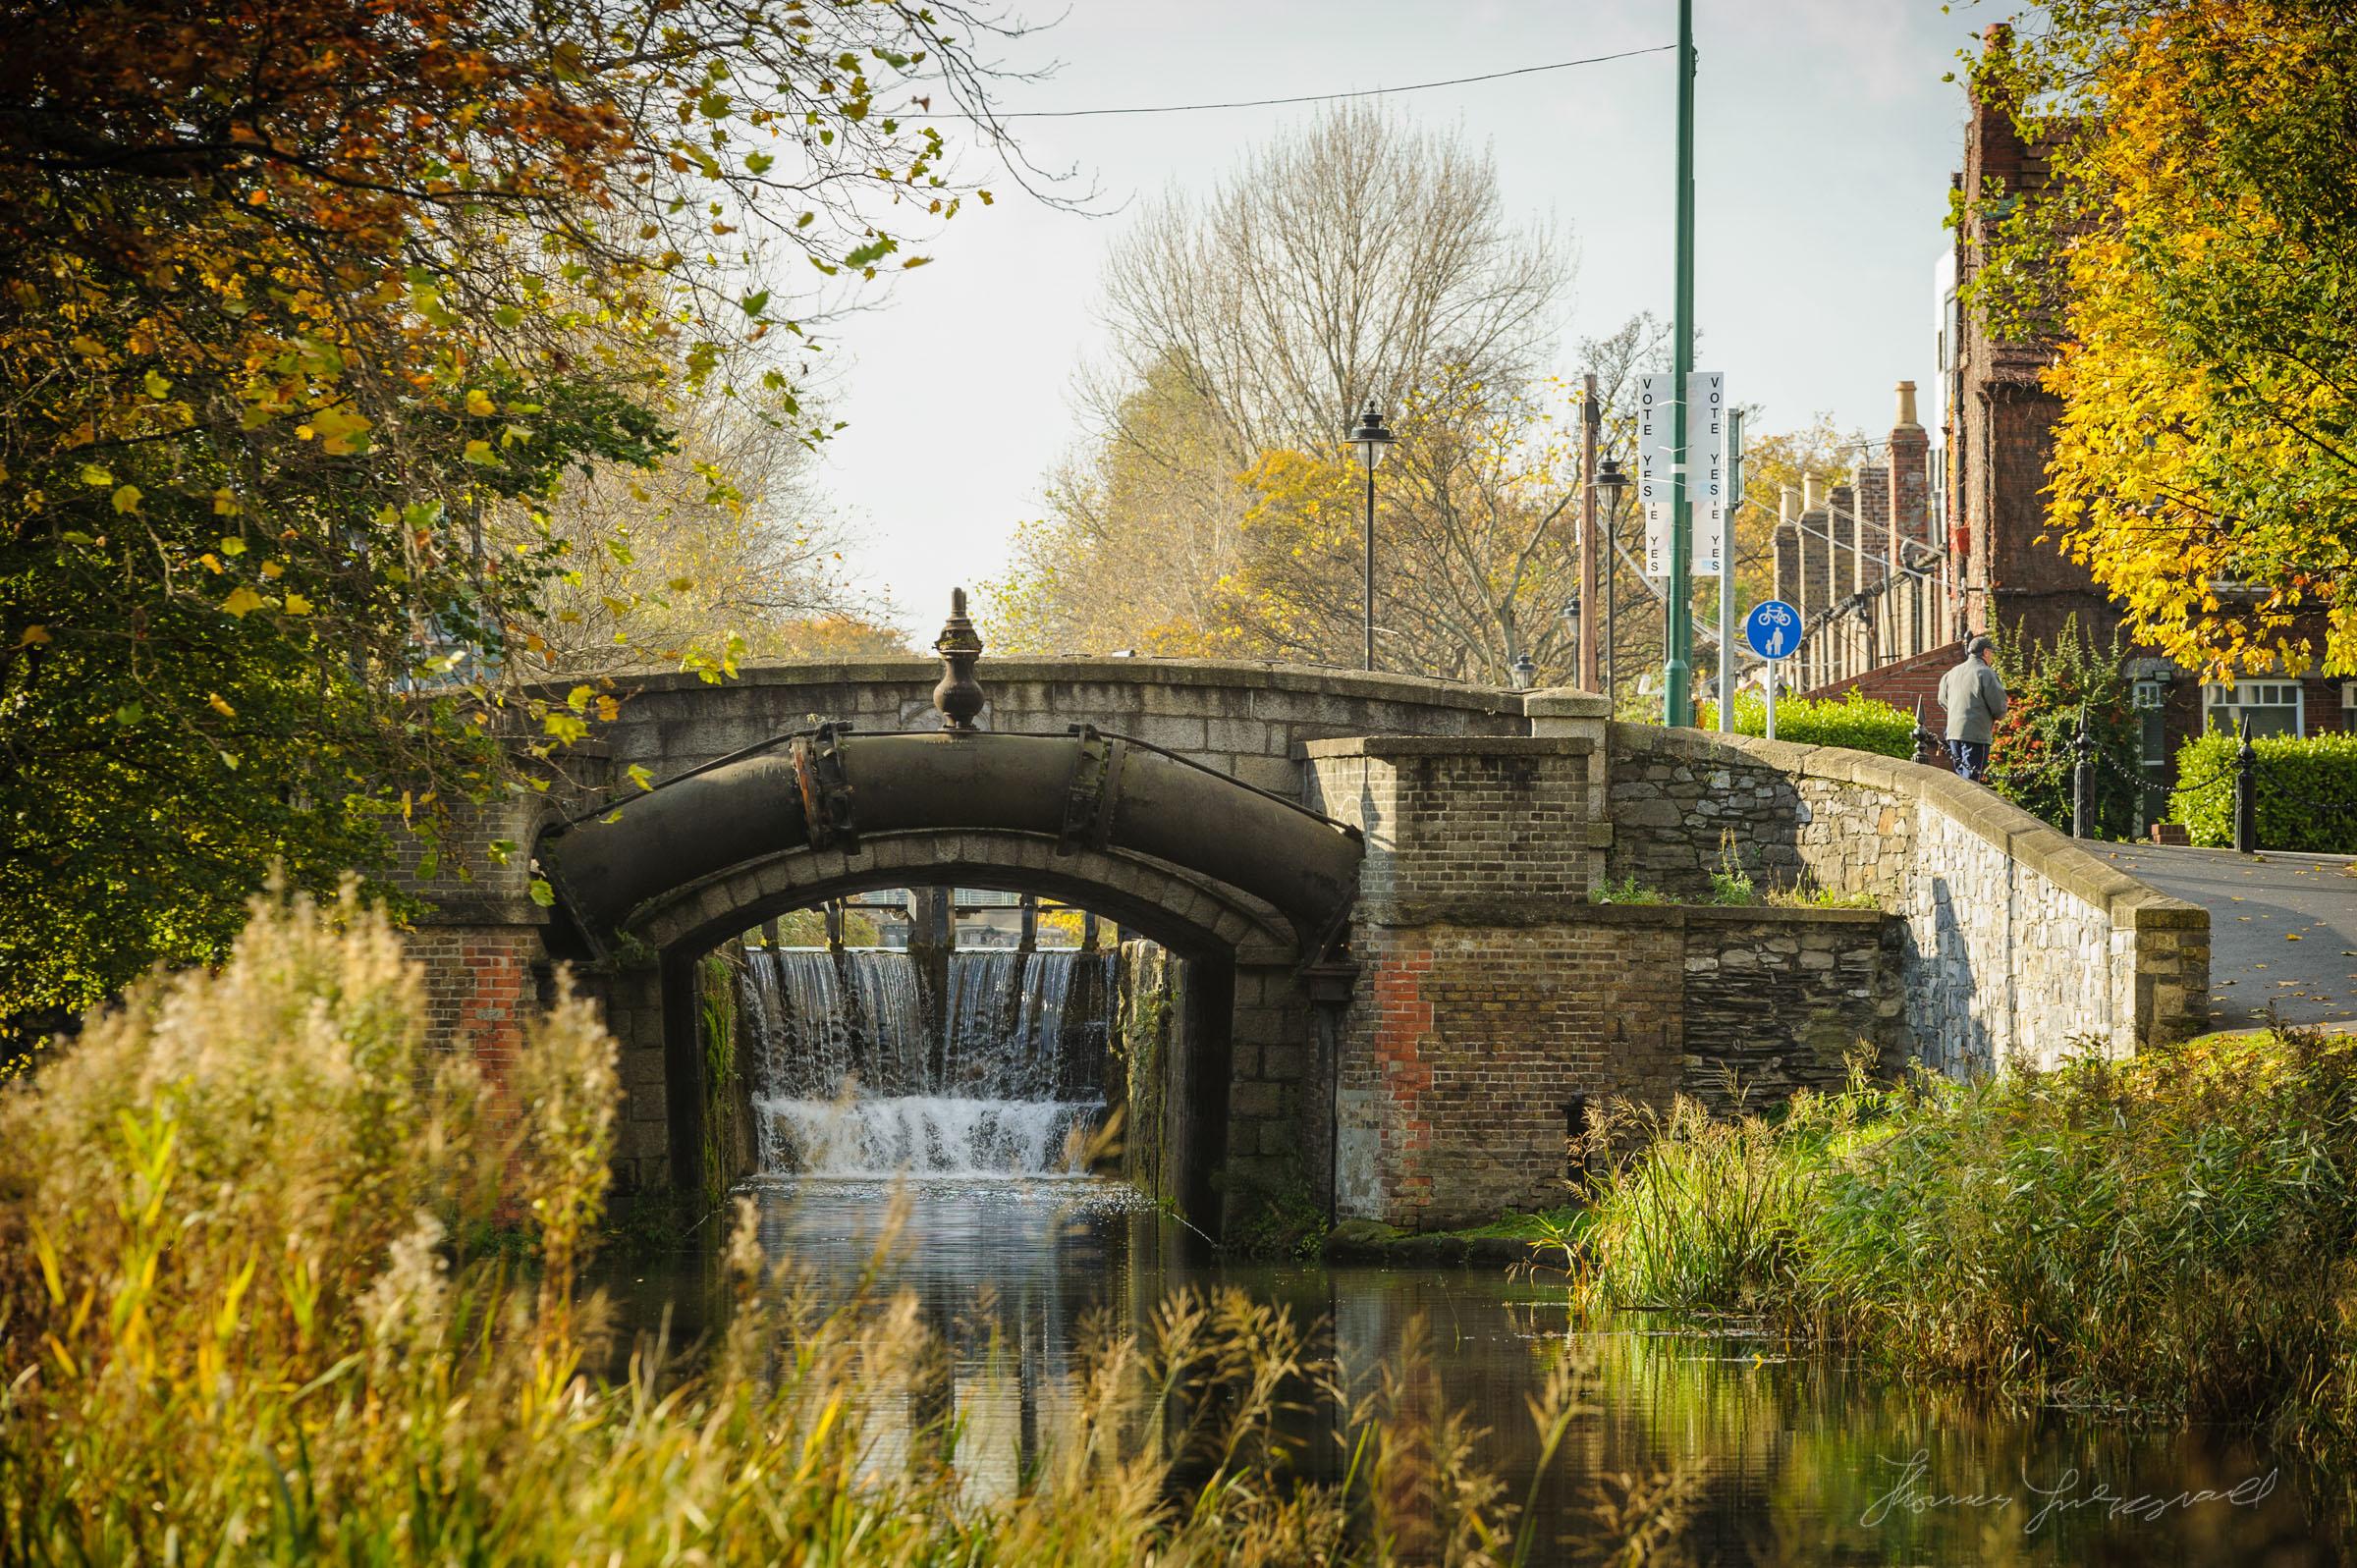 Streets-of-Dublin-Photo-3-5.jpg